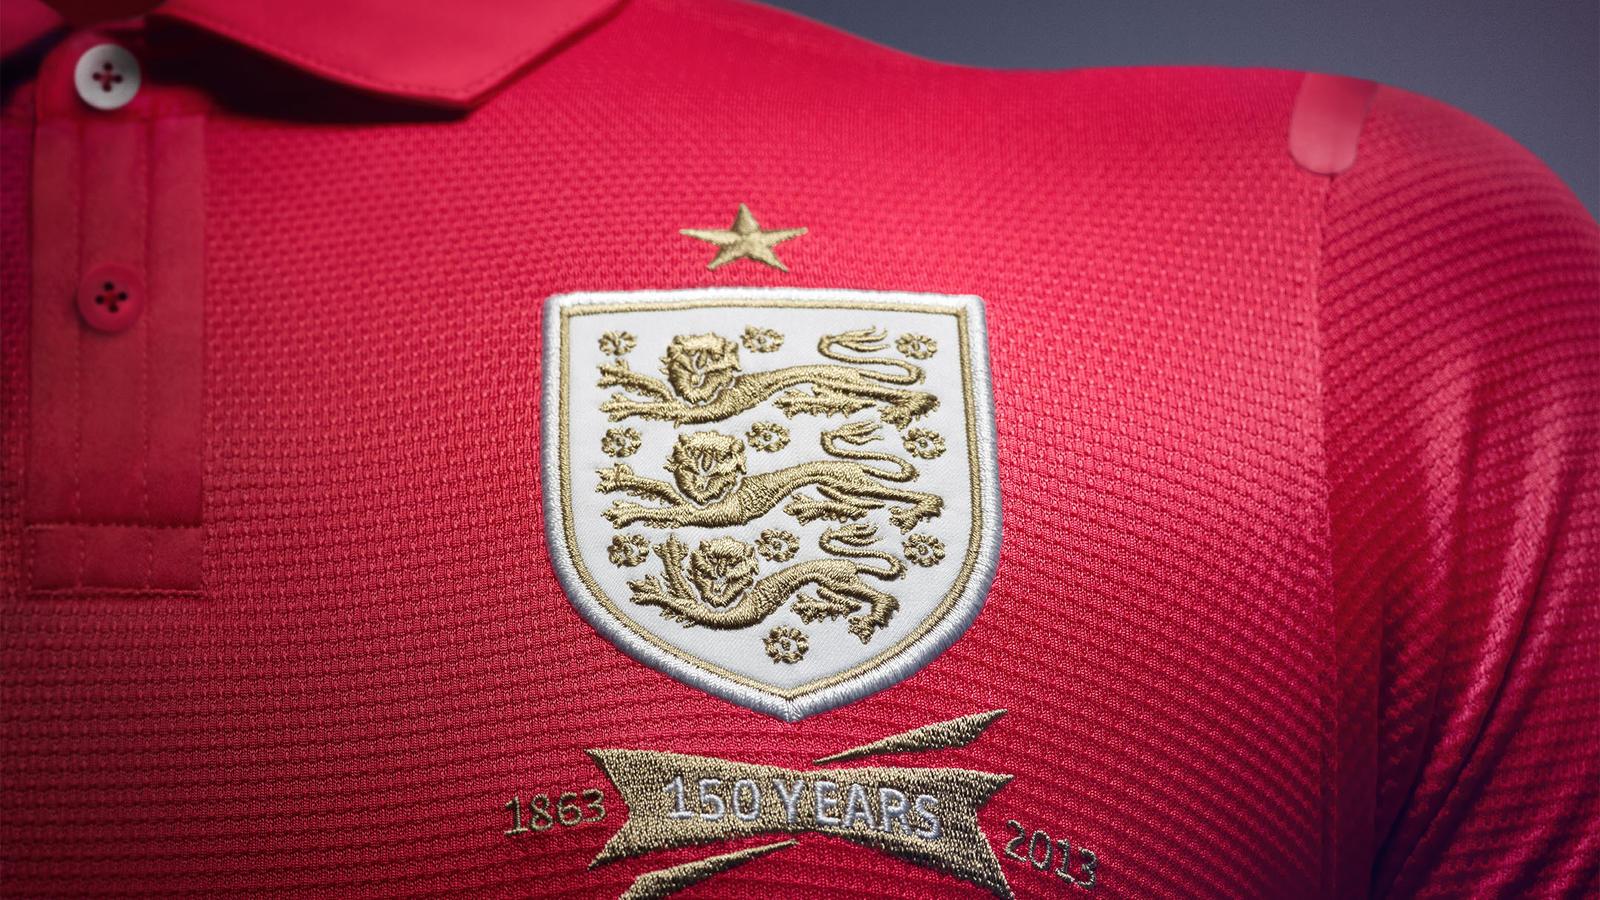 Nike S New England Away Kit Reflects Distinctive History And Style Nike News